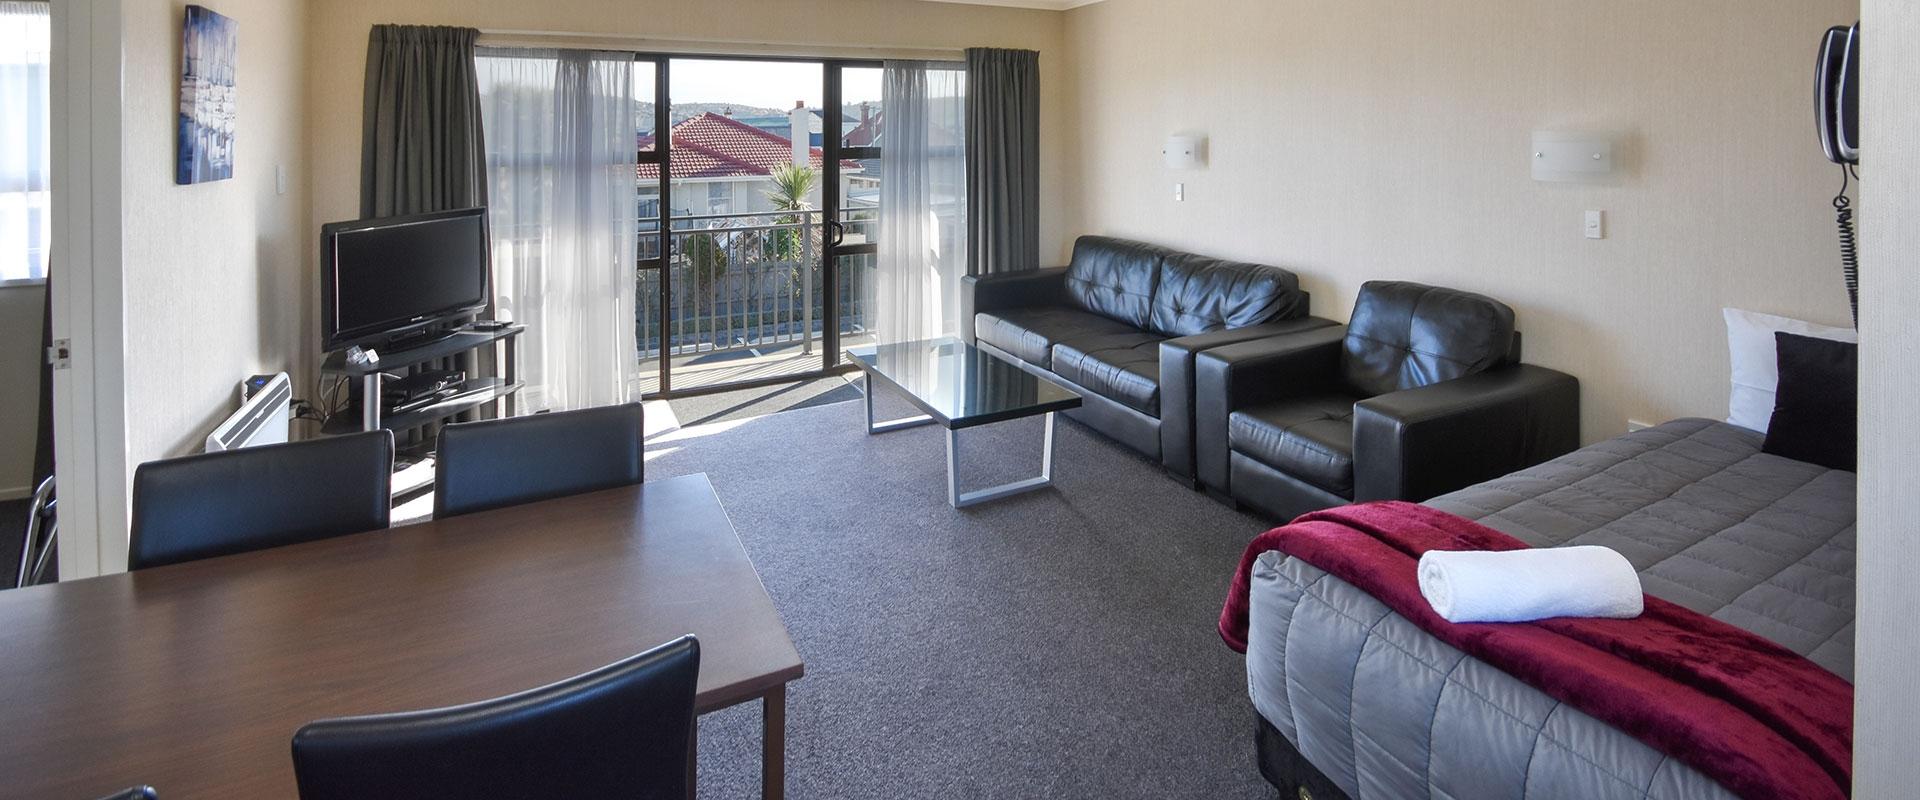 sunny motel rooms